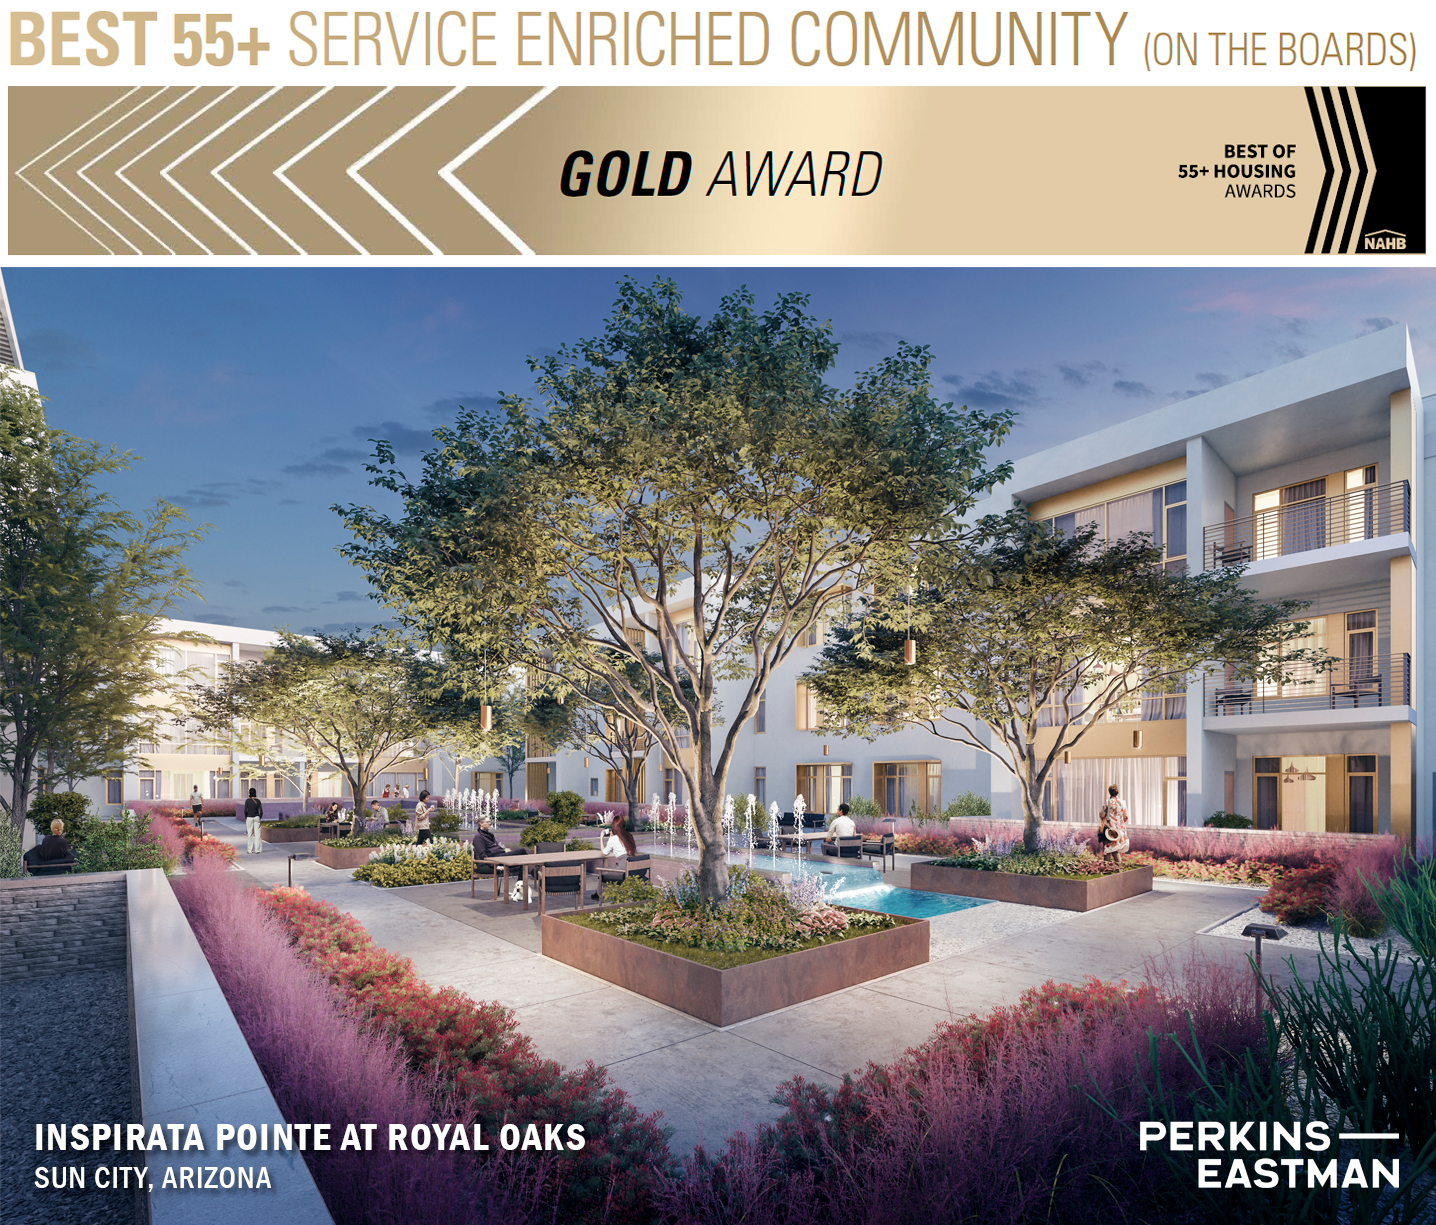 Perkins Eastman Sweeps National Association of Home Builders 55+ Housing Awards 1